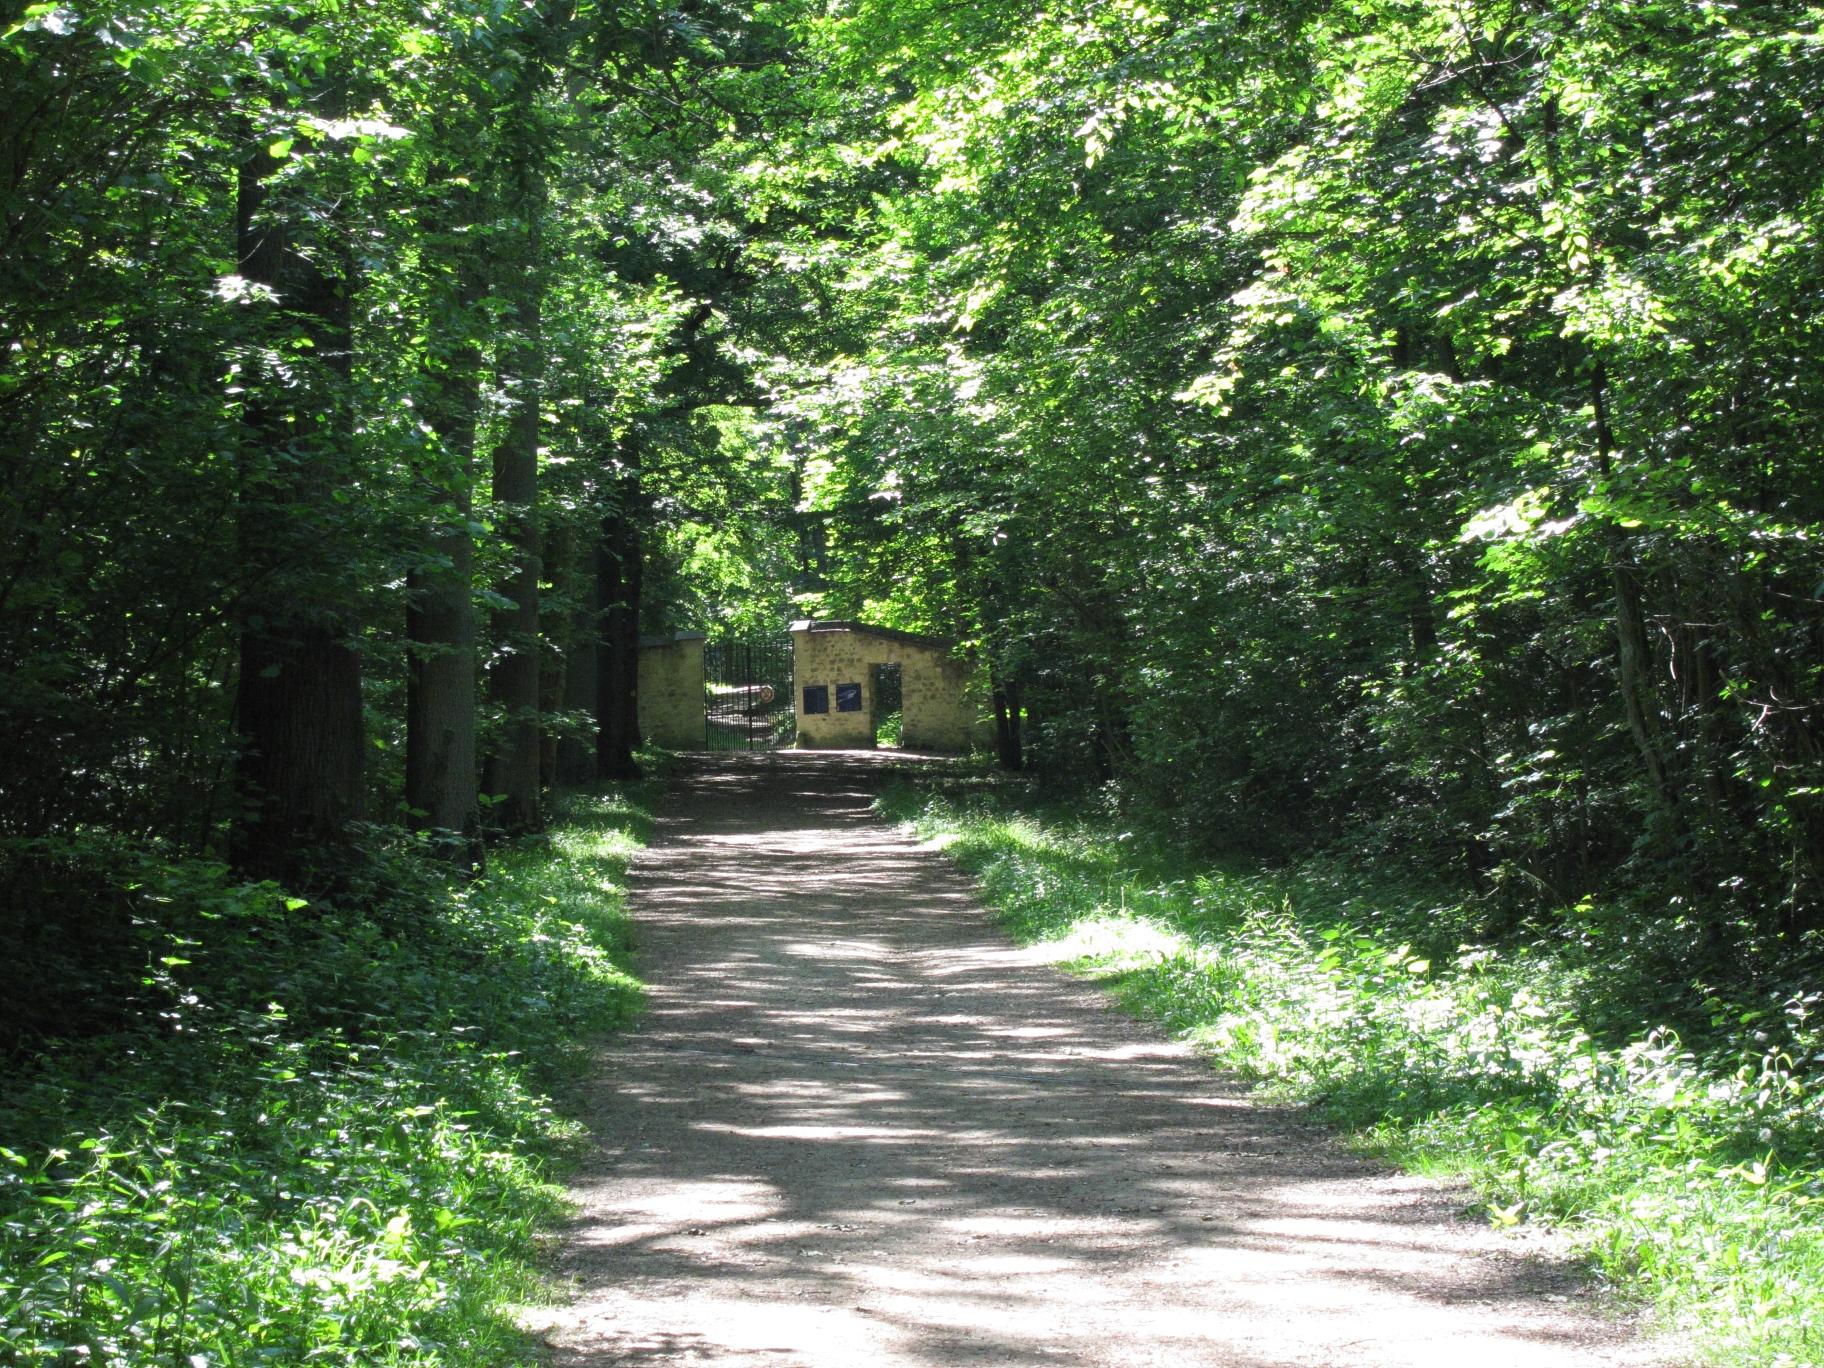 The Route du Pré Cure, leading to the gate of the domain of the Château d'Ecouen.